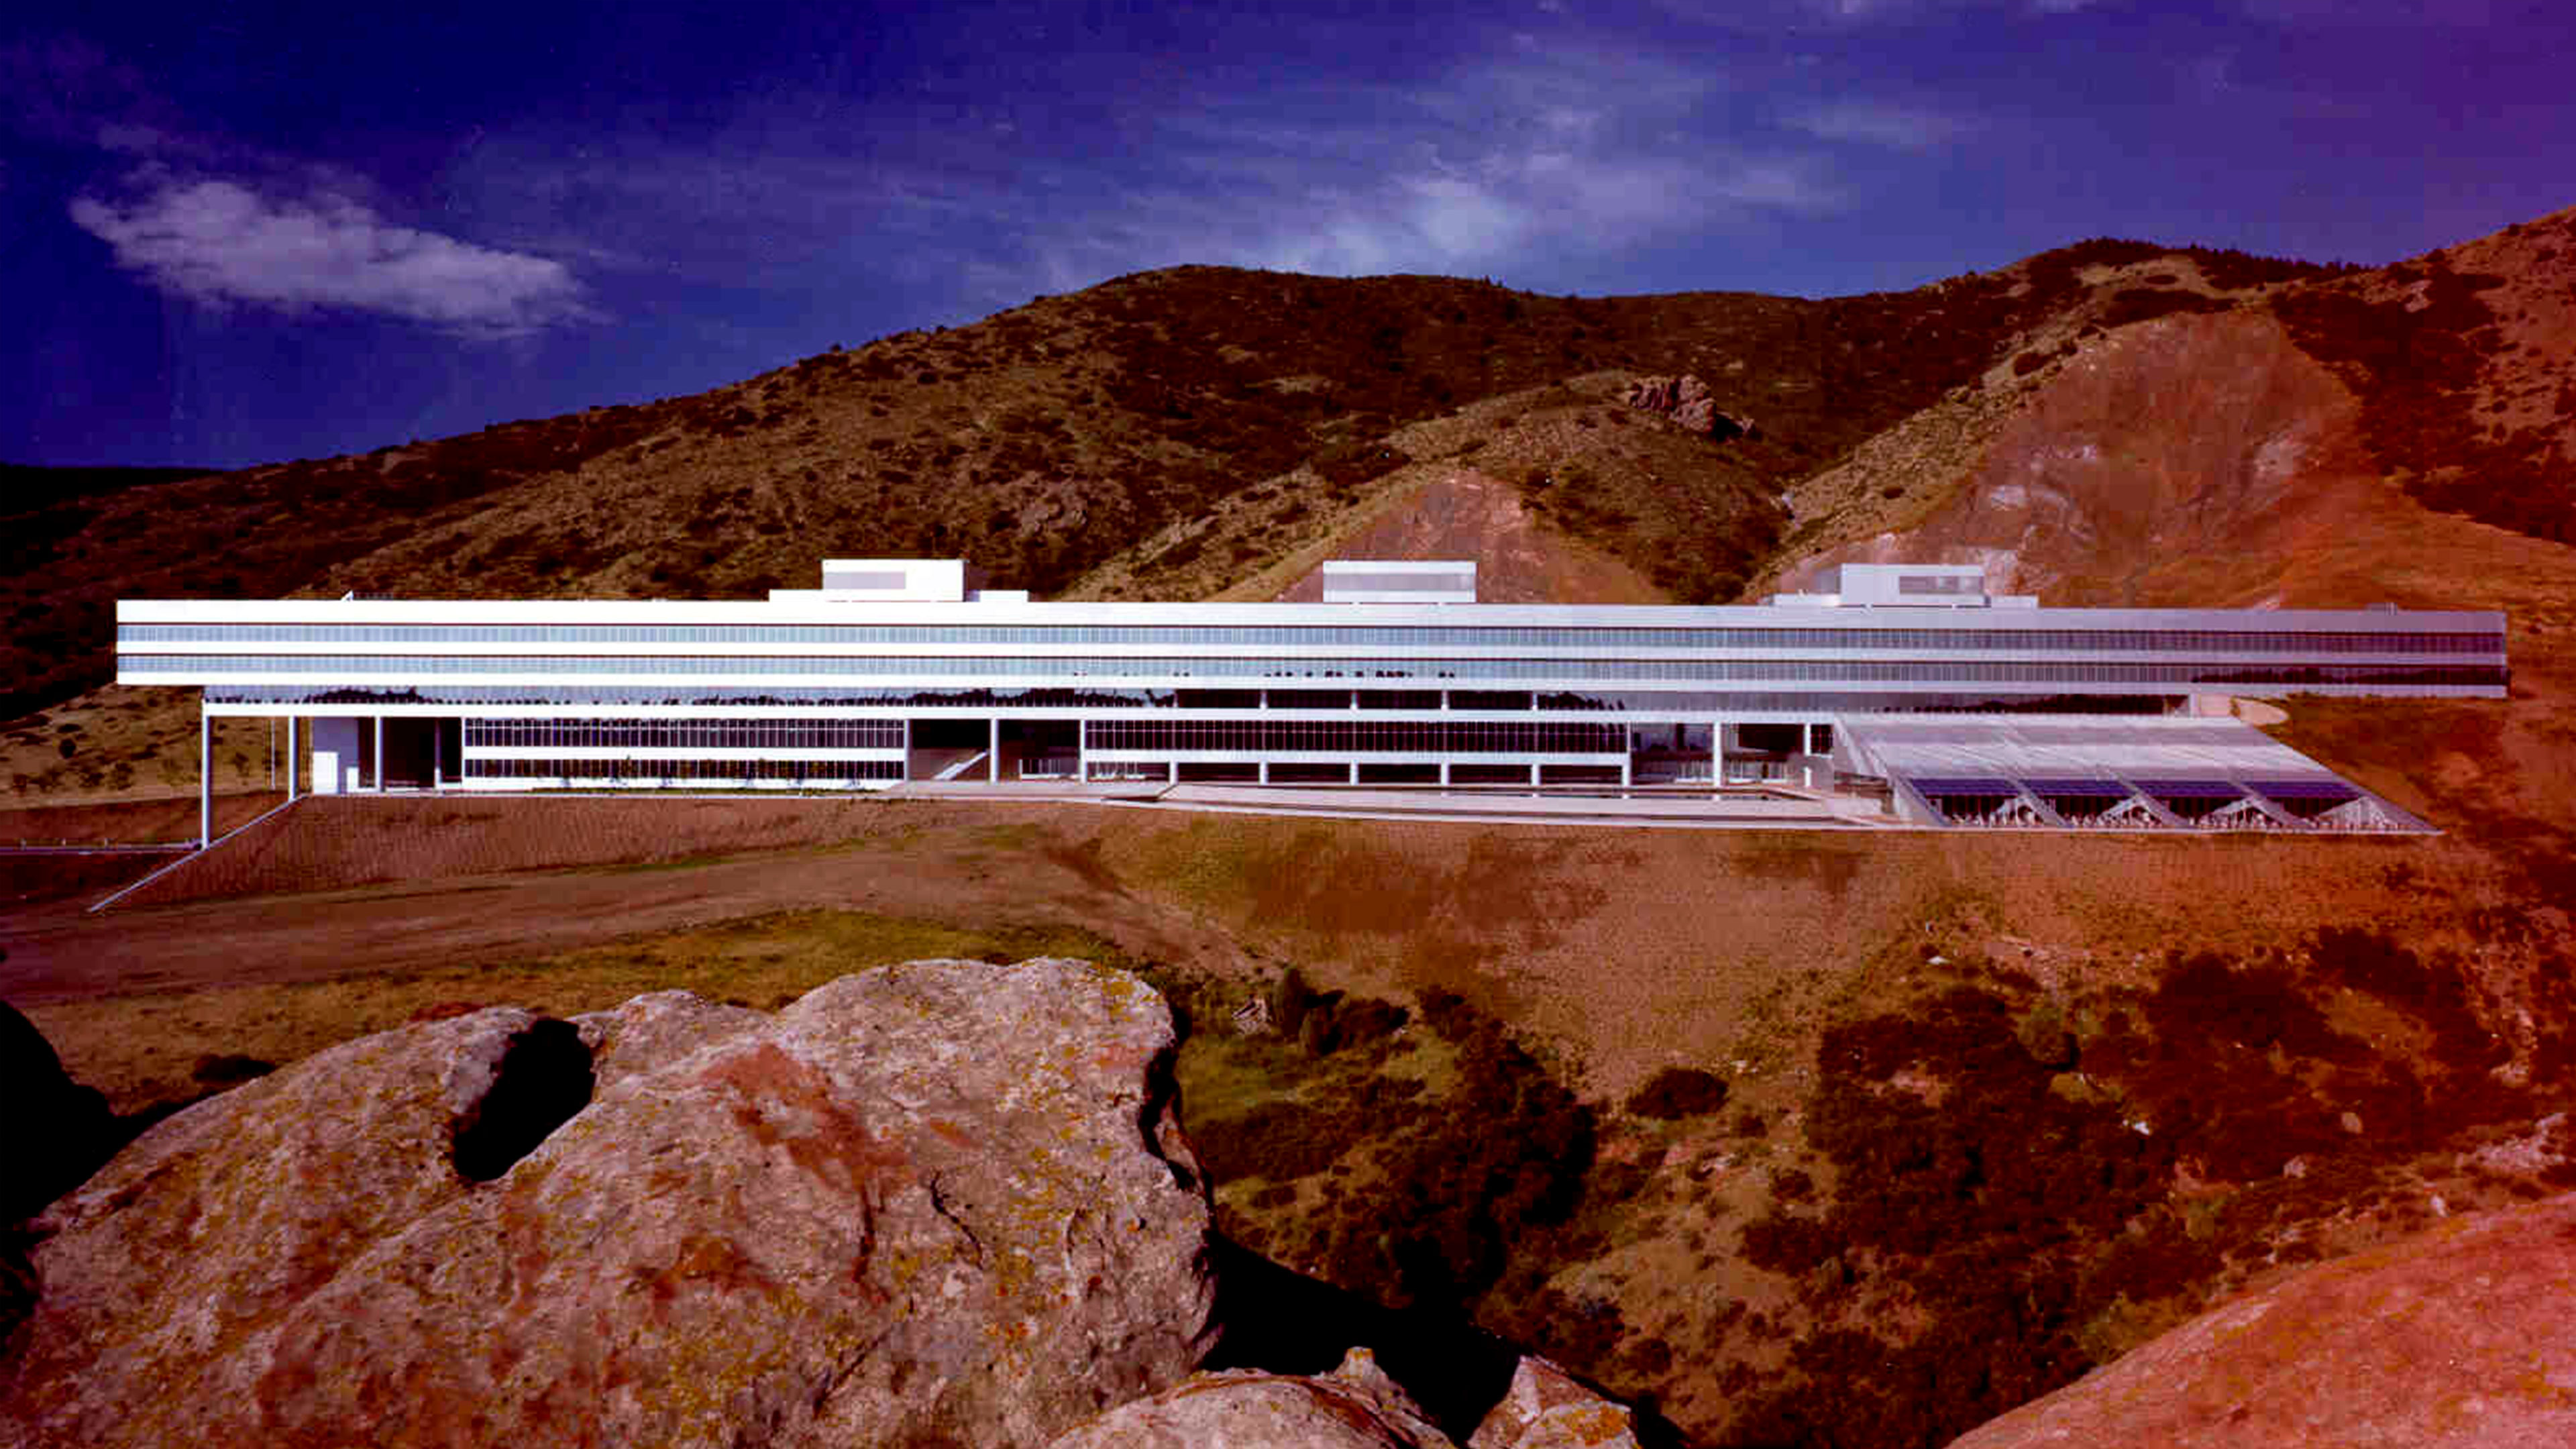 Johns-Manville World Headquarters | LeMessurier